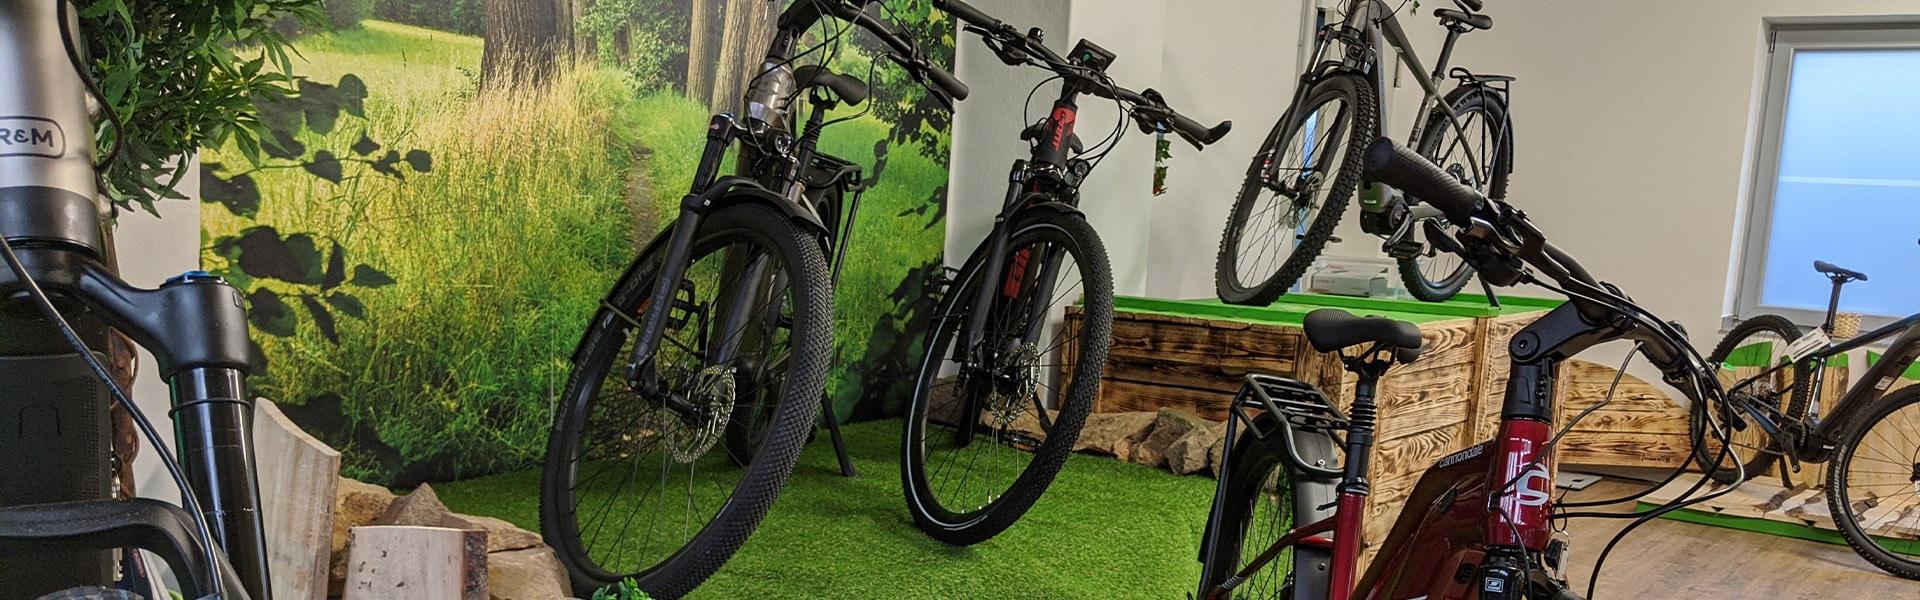 Der Shop der e-motion e-Bike Welt Halver